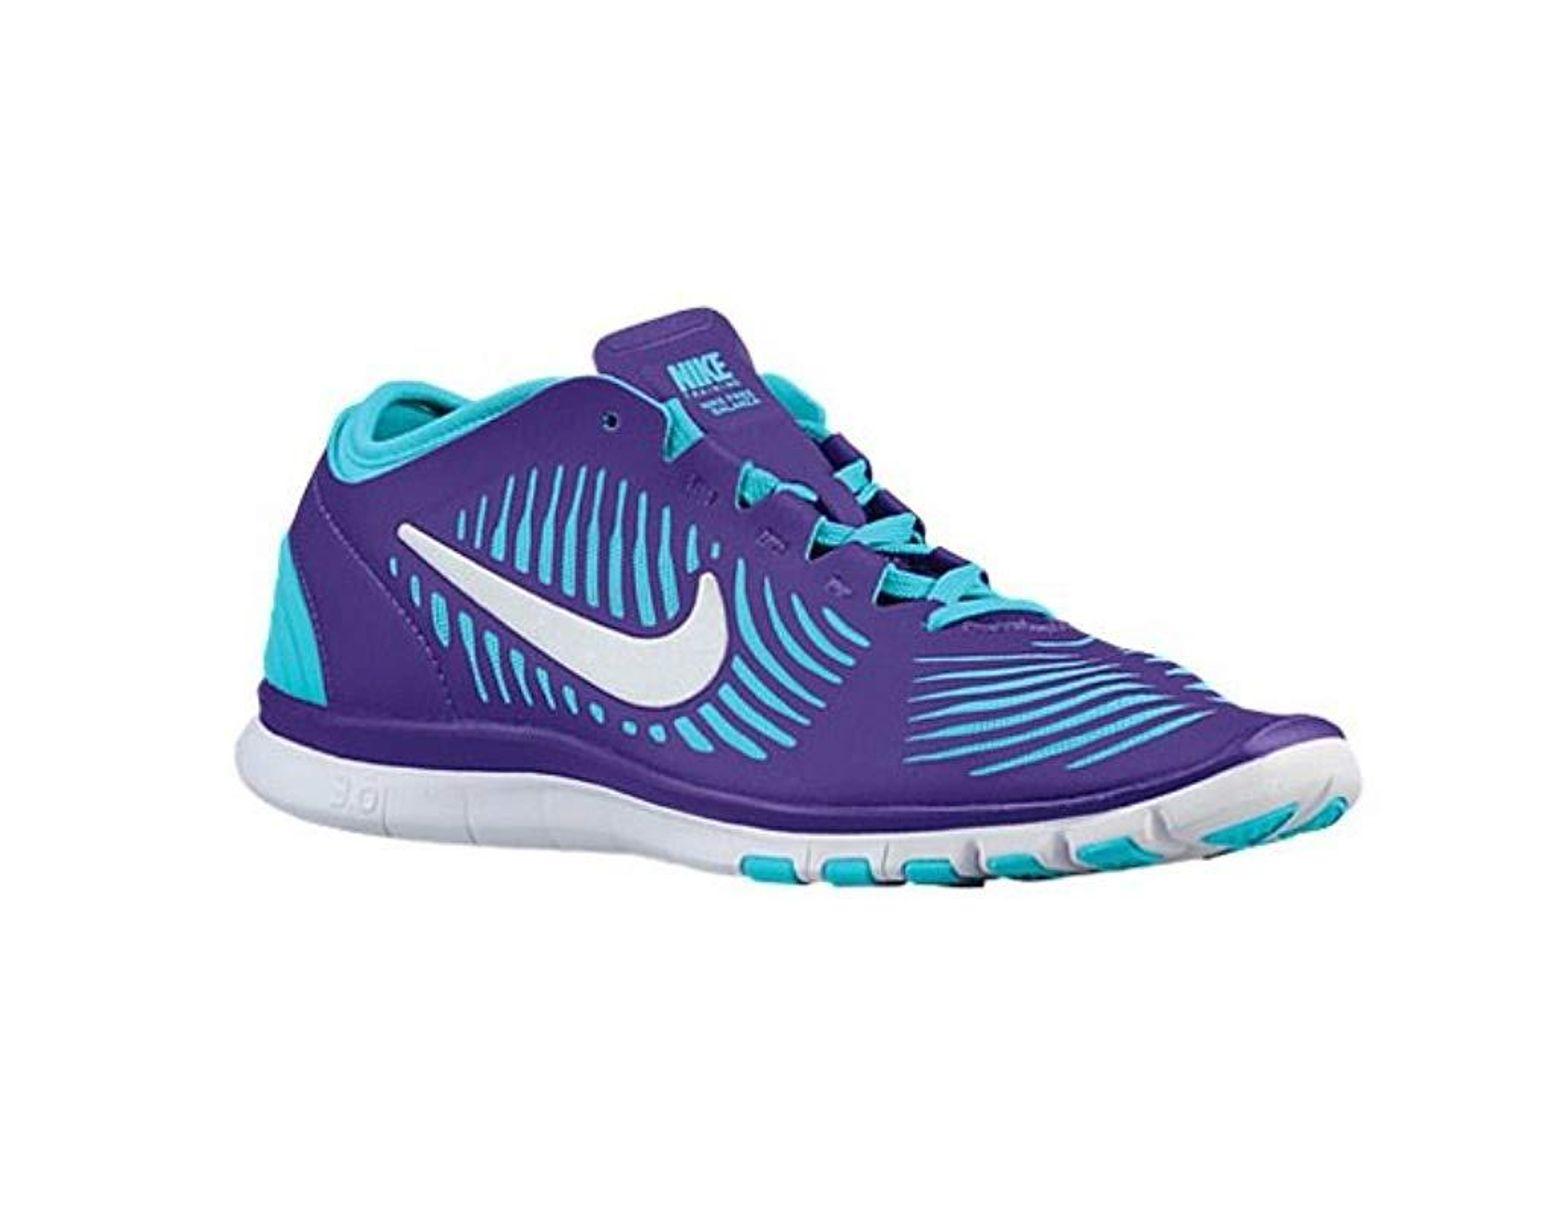 05f1576bb233a Nike Free Balanza Training Running Shoes-crt Purple/mtllc Slvr/gmm ...